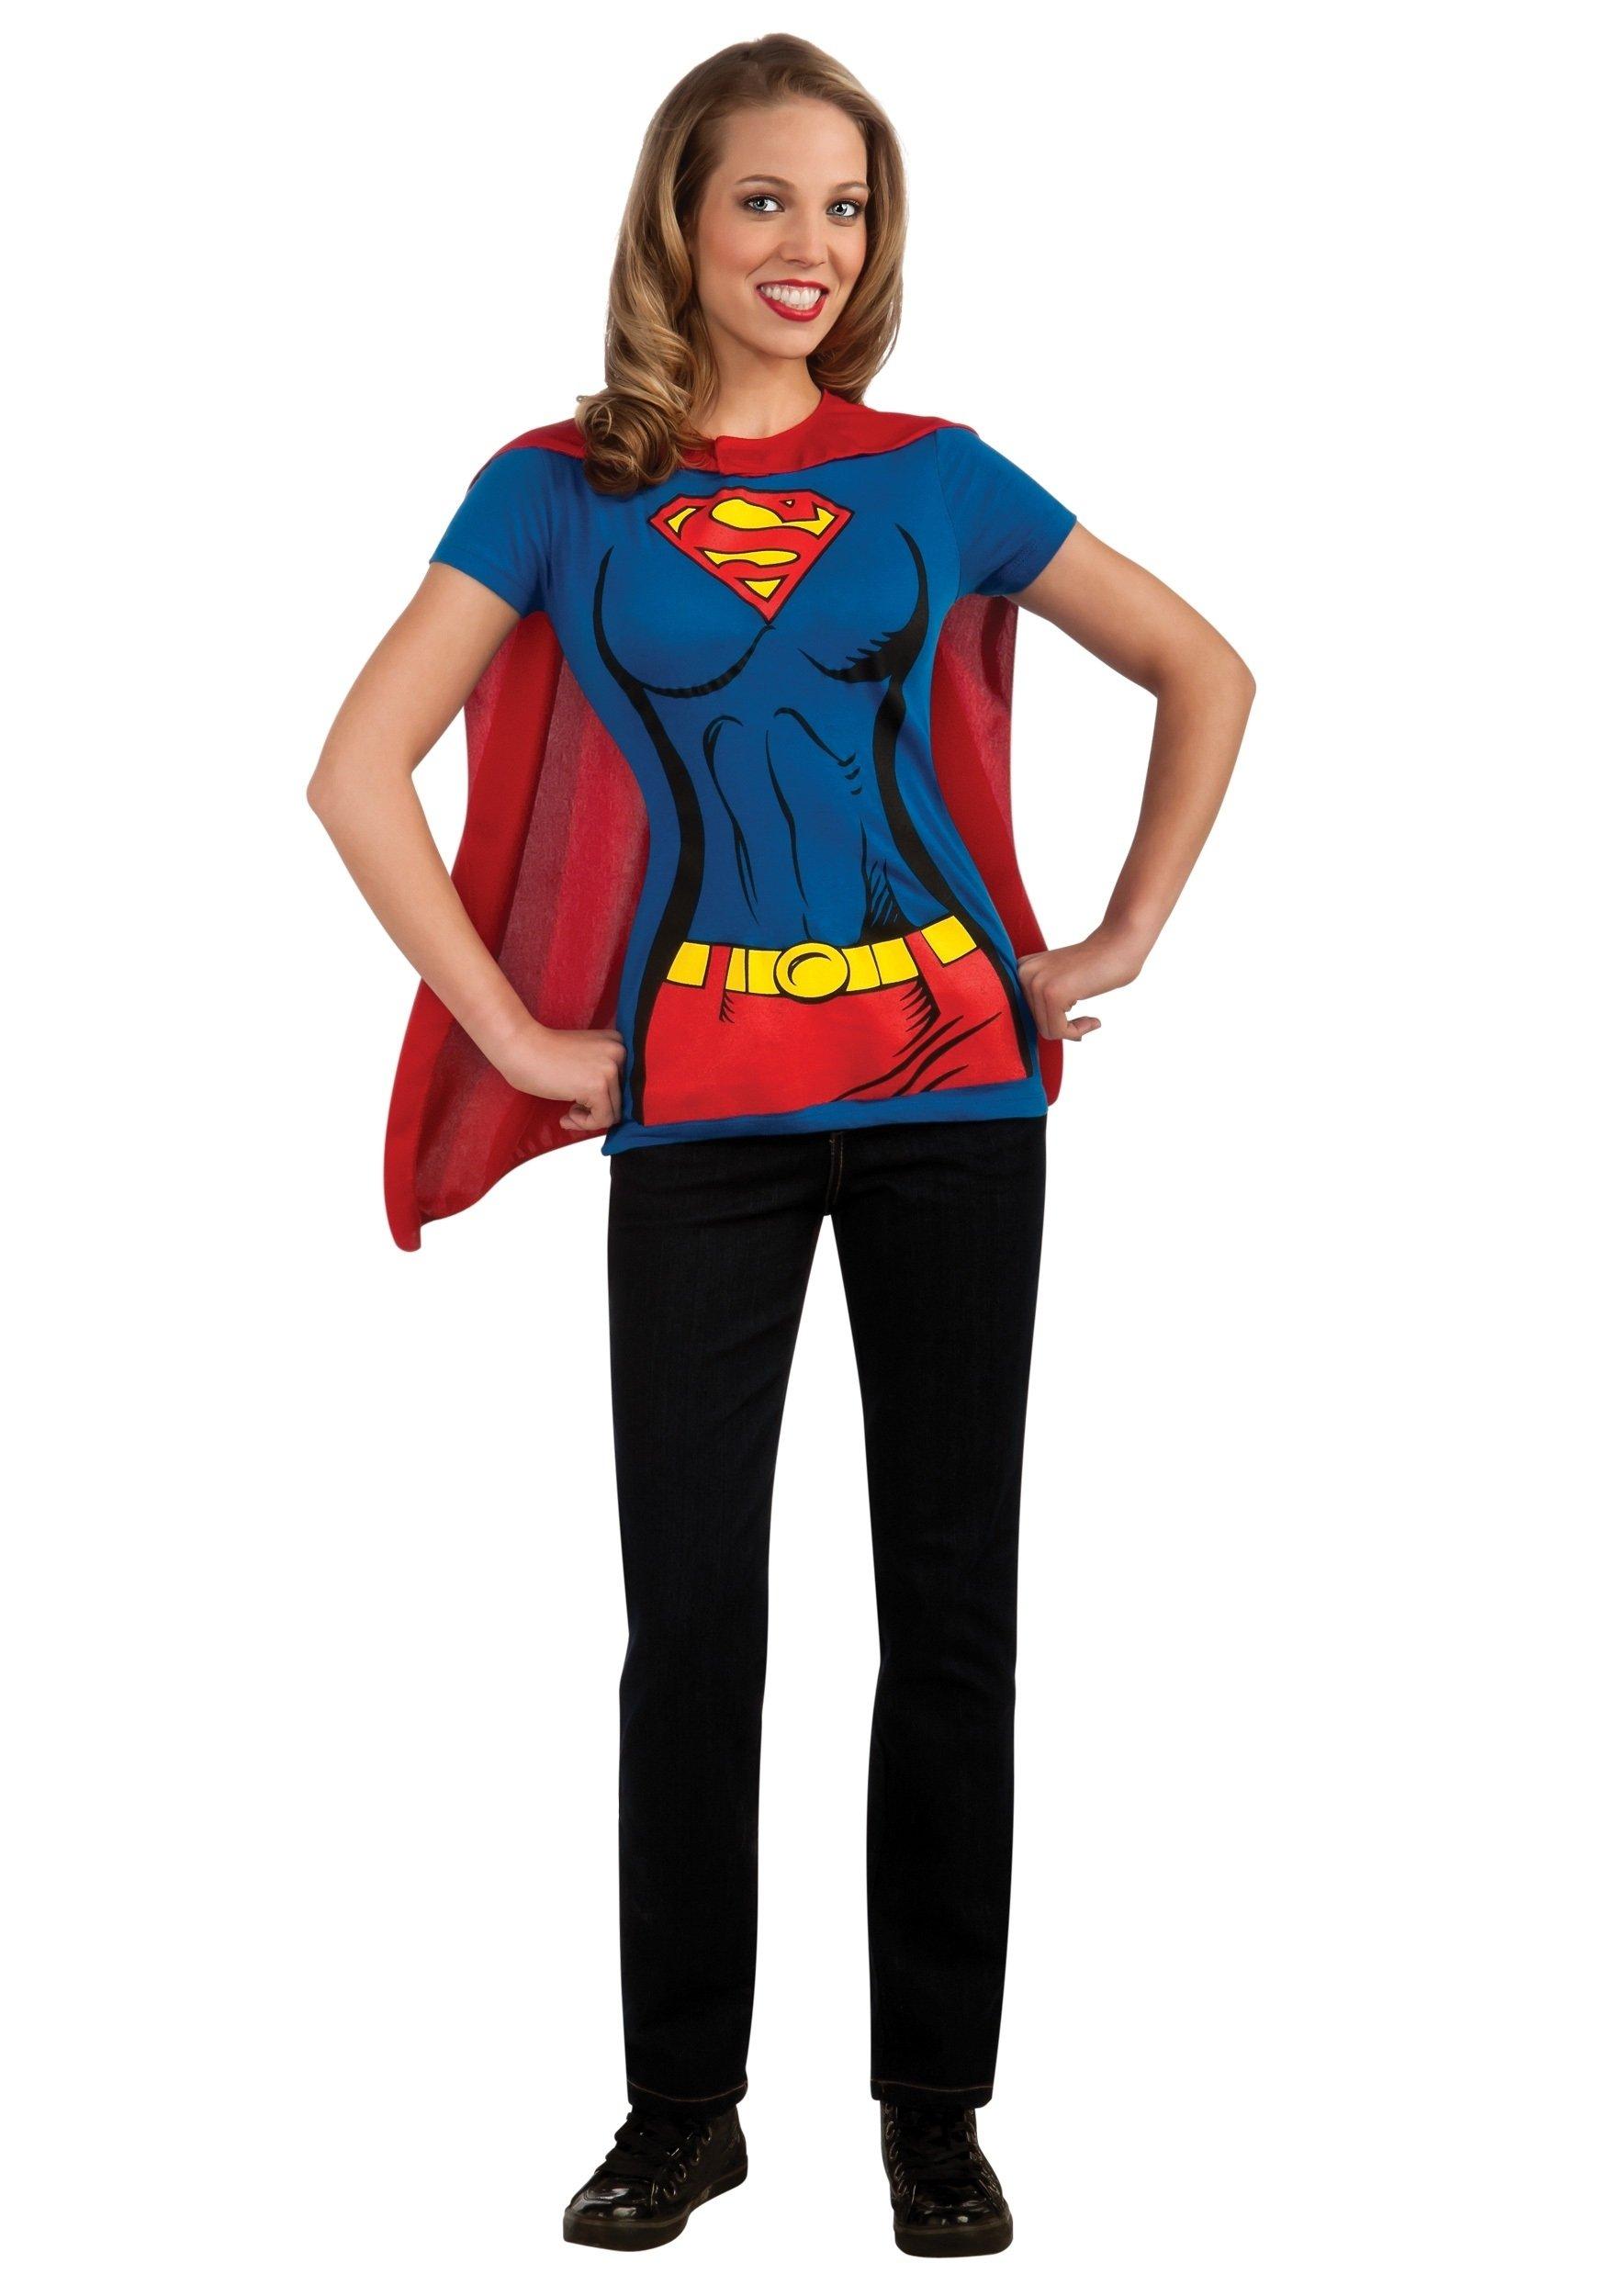 10 Fashionable Made Up Superhero Costume Ideas supergirl t shirt costume easy superhero costume ideas 1 2020